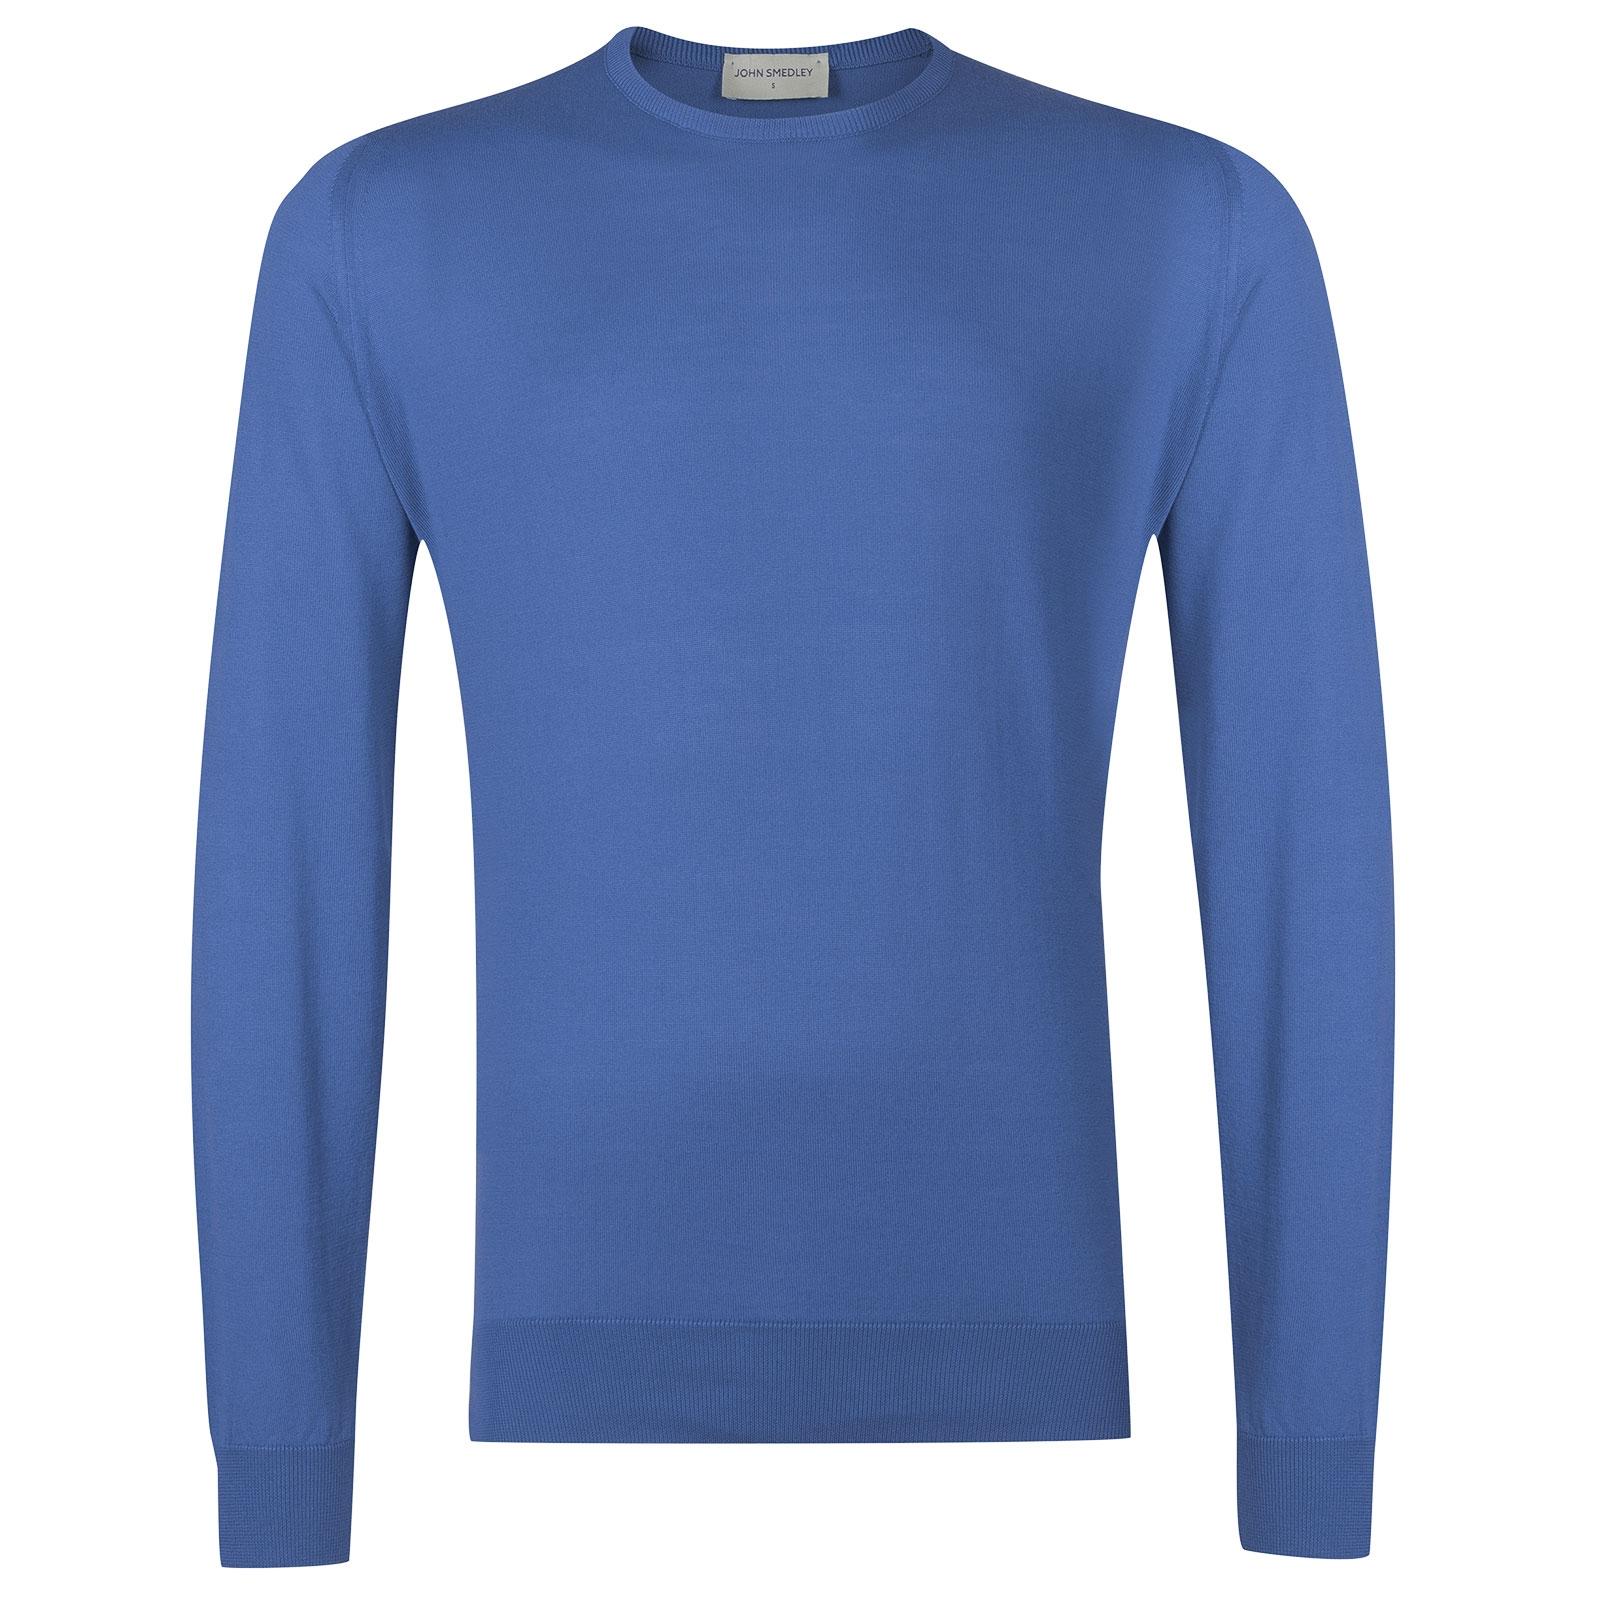 John Smedley HatfieldSea Island Cotton Pullover in Chambray Blue-XXL